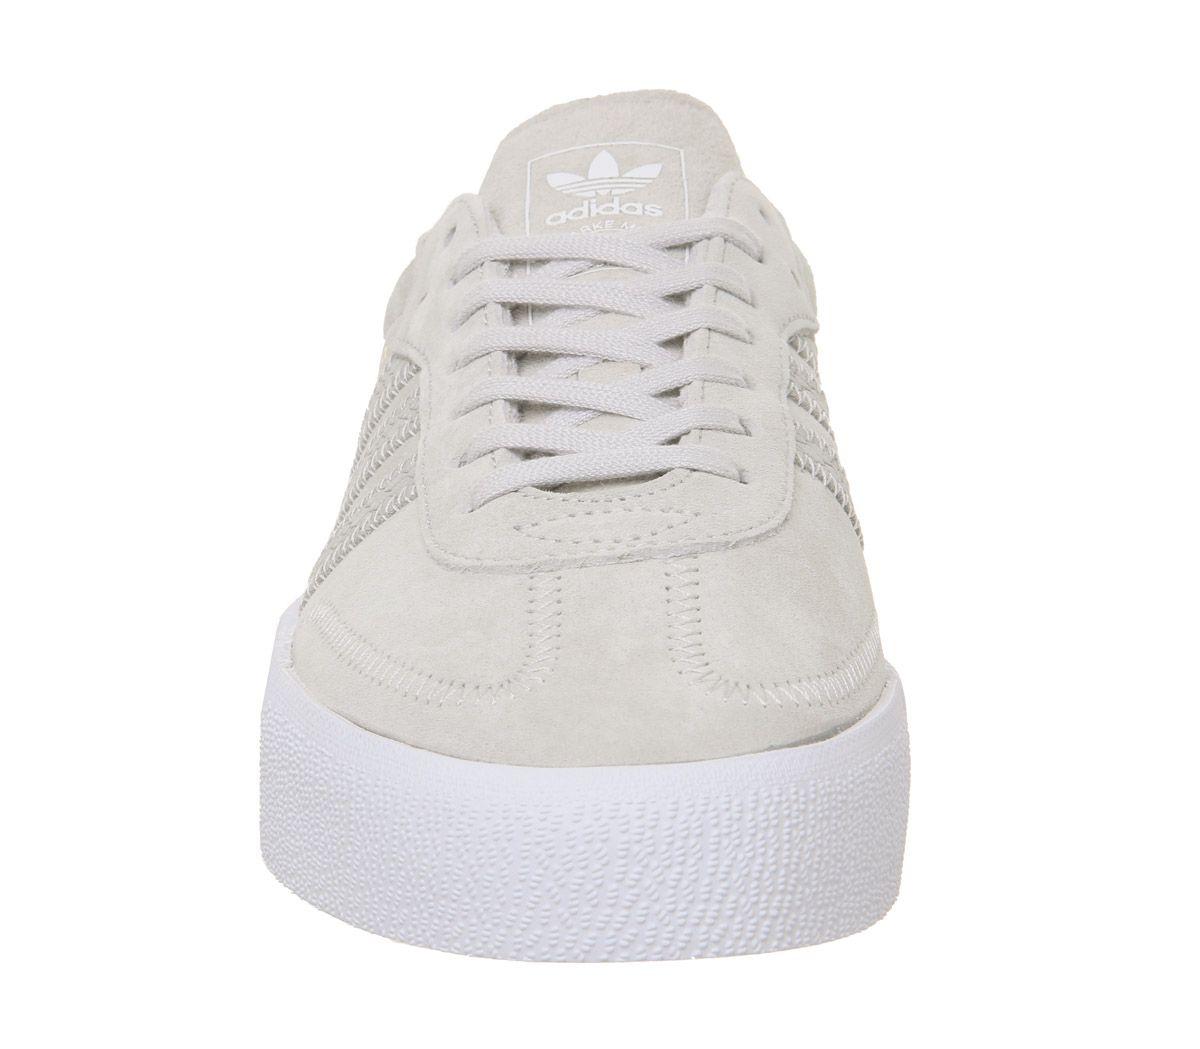 Samba Rose Turn Damen Zu One Weiß Details Turnschuhe Grau Schuhe Adidas qzVpGSUM